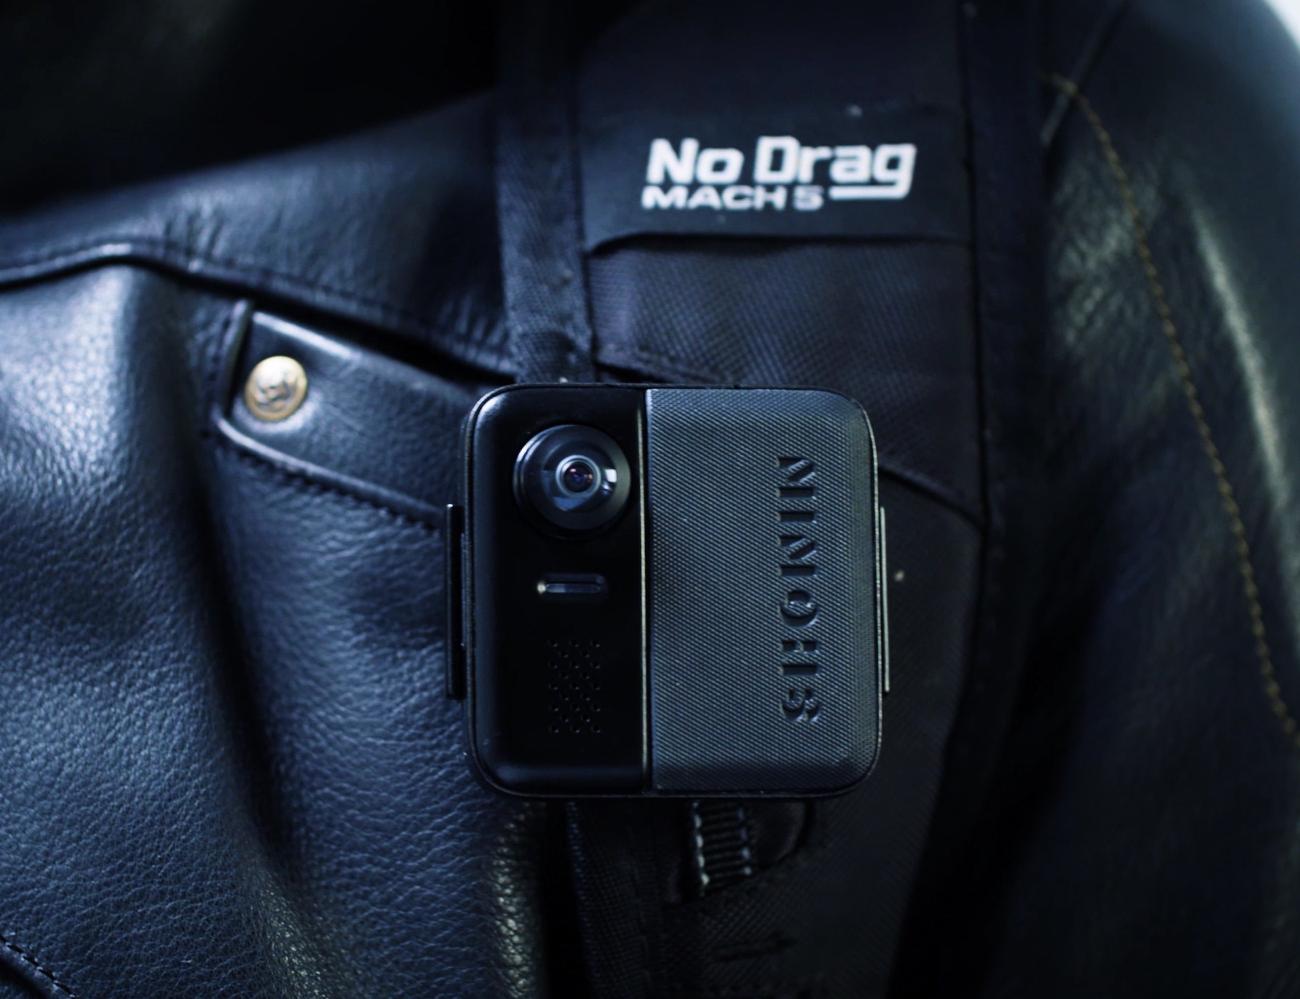 Shonin Streamcam Compact Wearable Camera